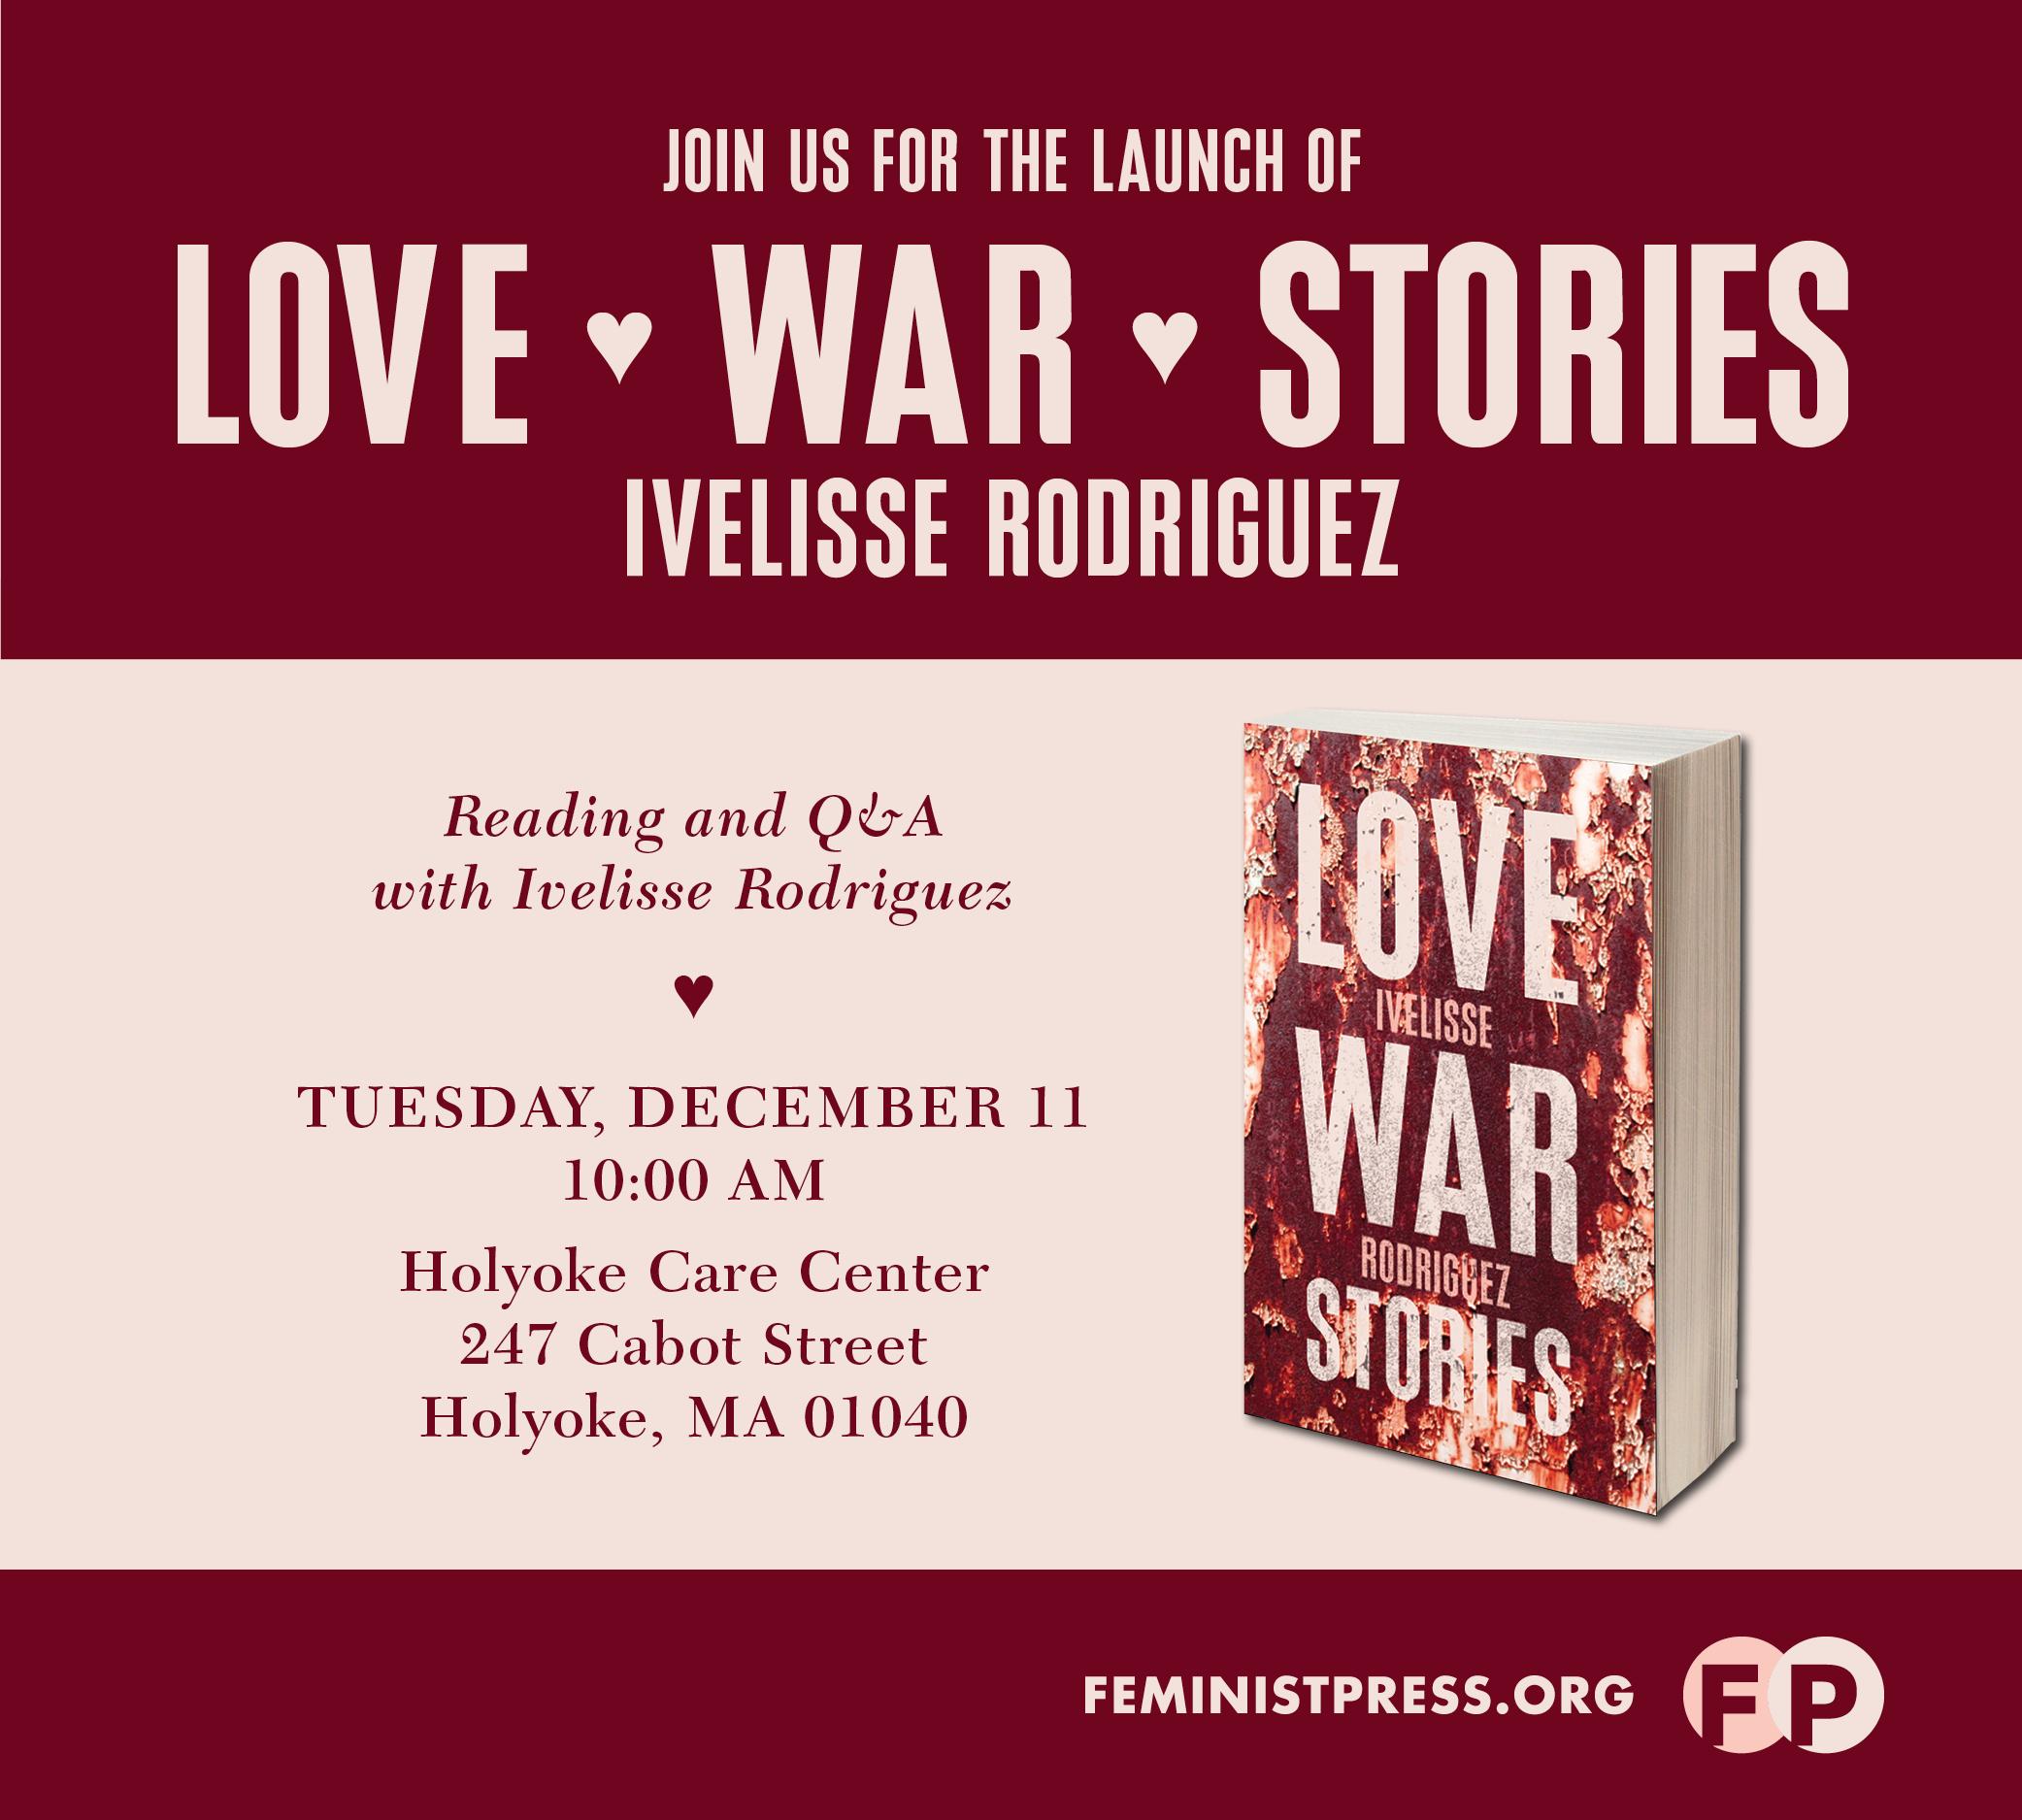 LOVE_WAR_STORIES_Event_eblast_Holyoke.jpg